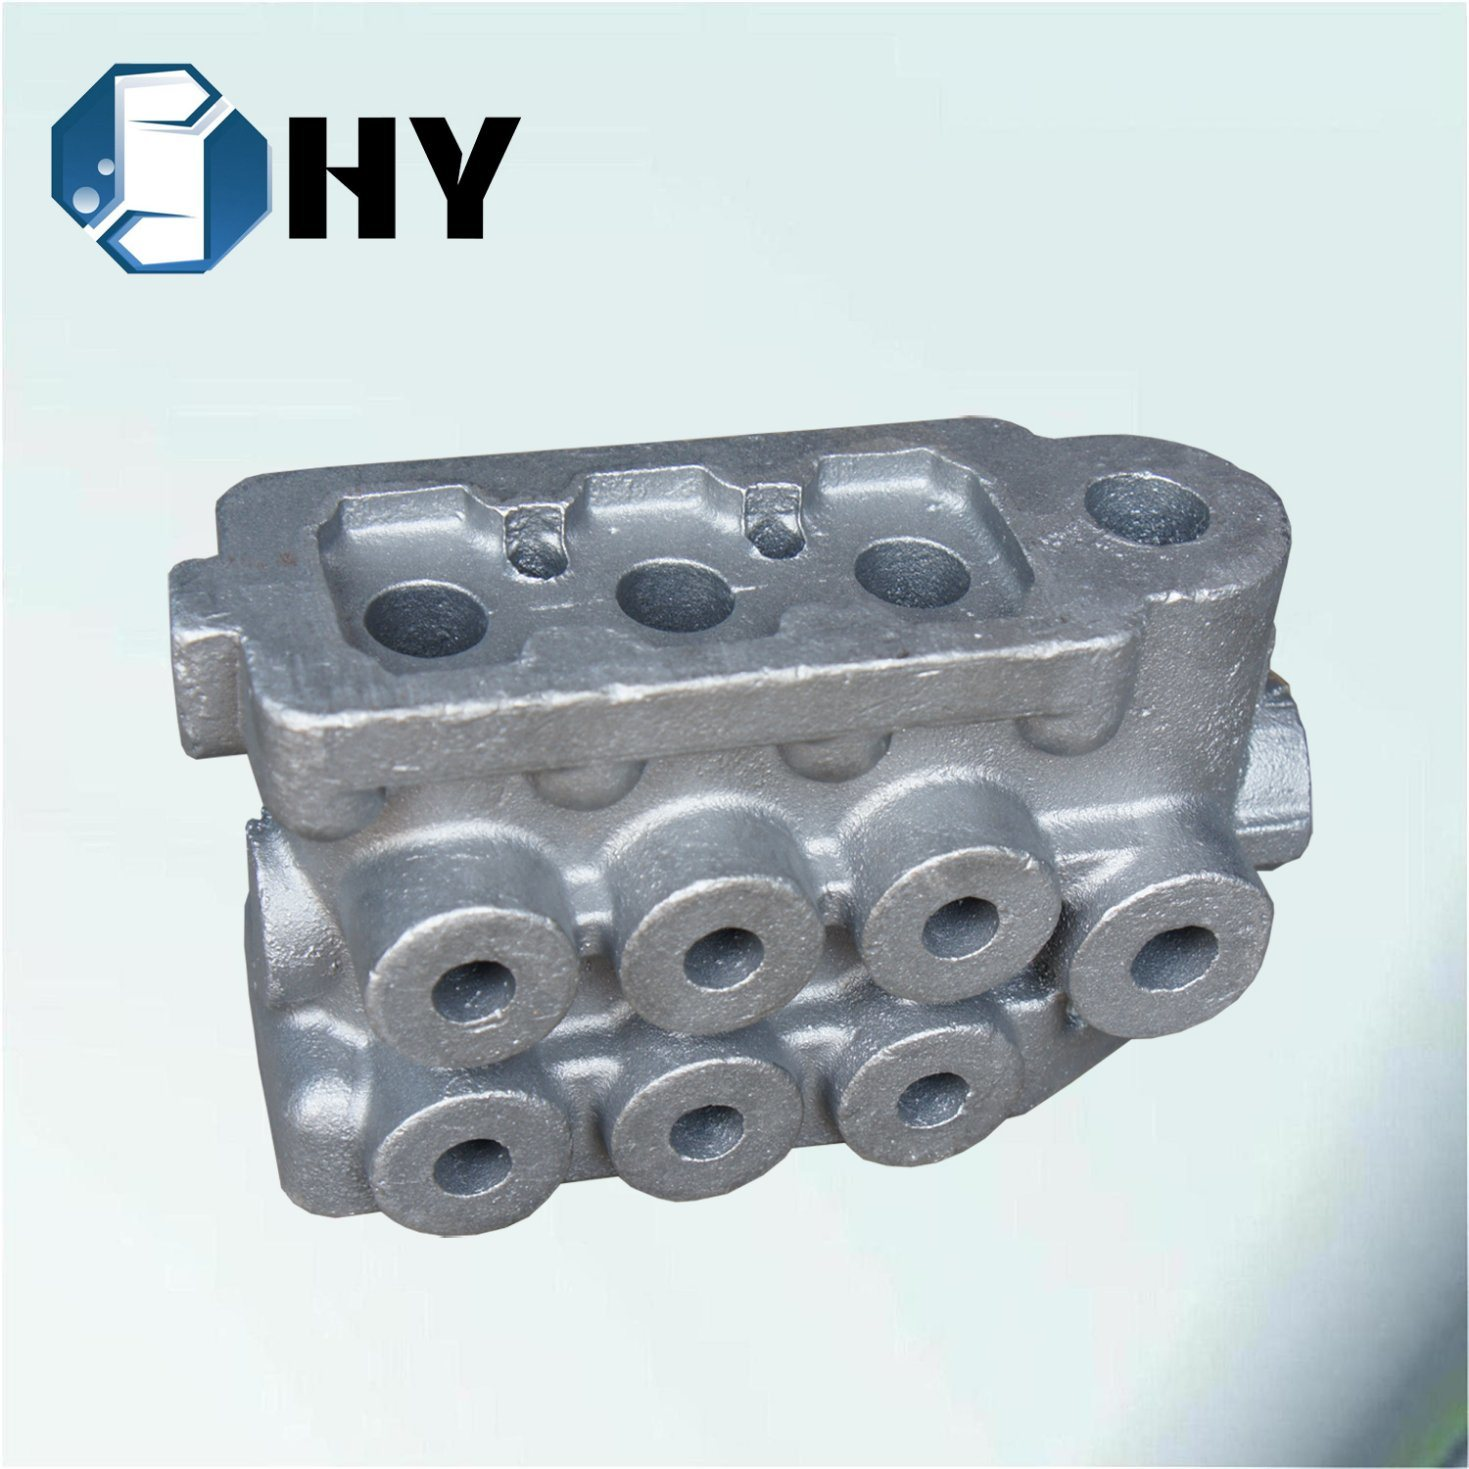 Wrought Iron Car Parts Flywheel Control Valve Body Sand Casting